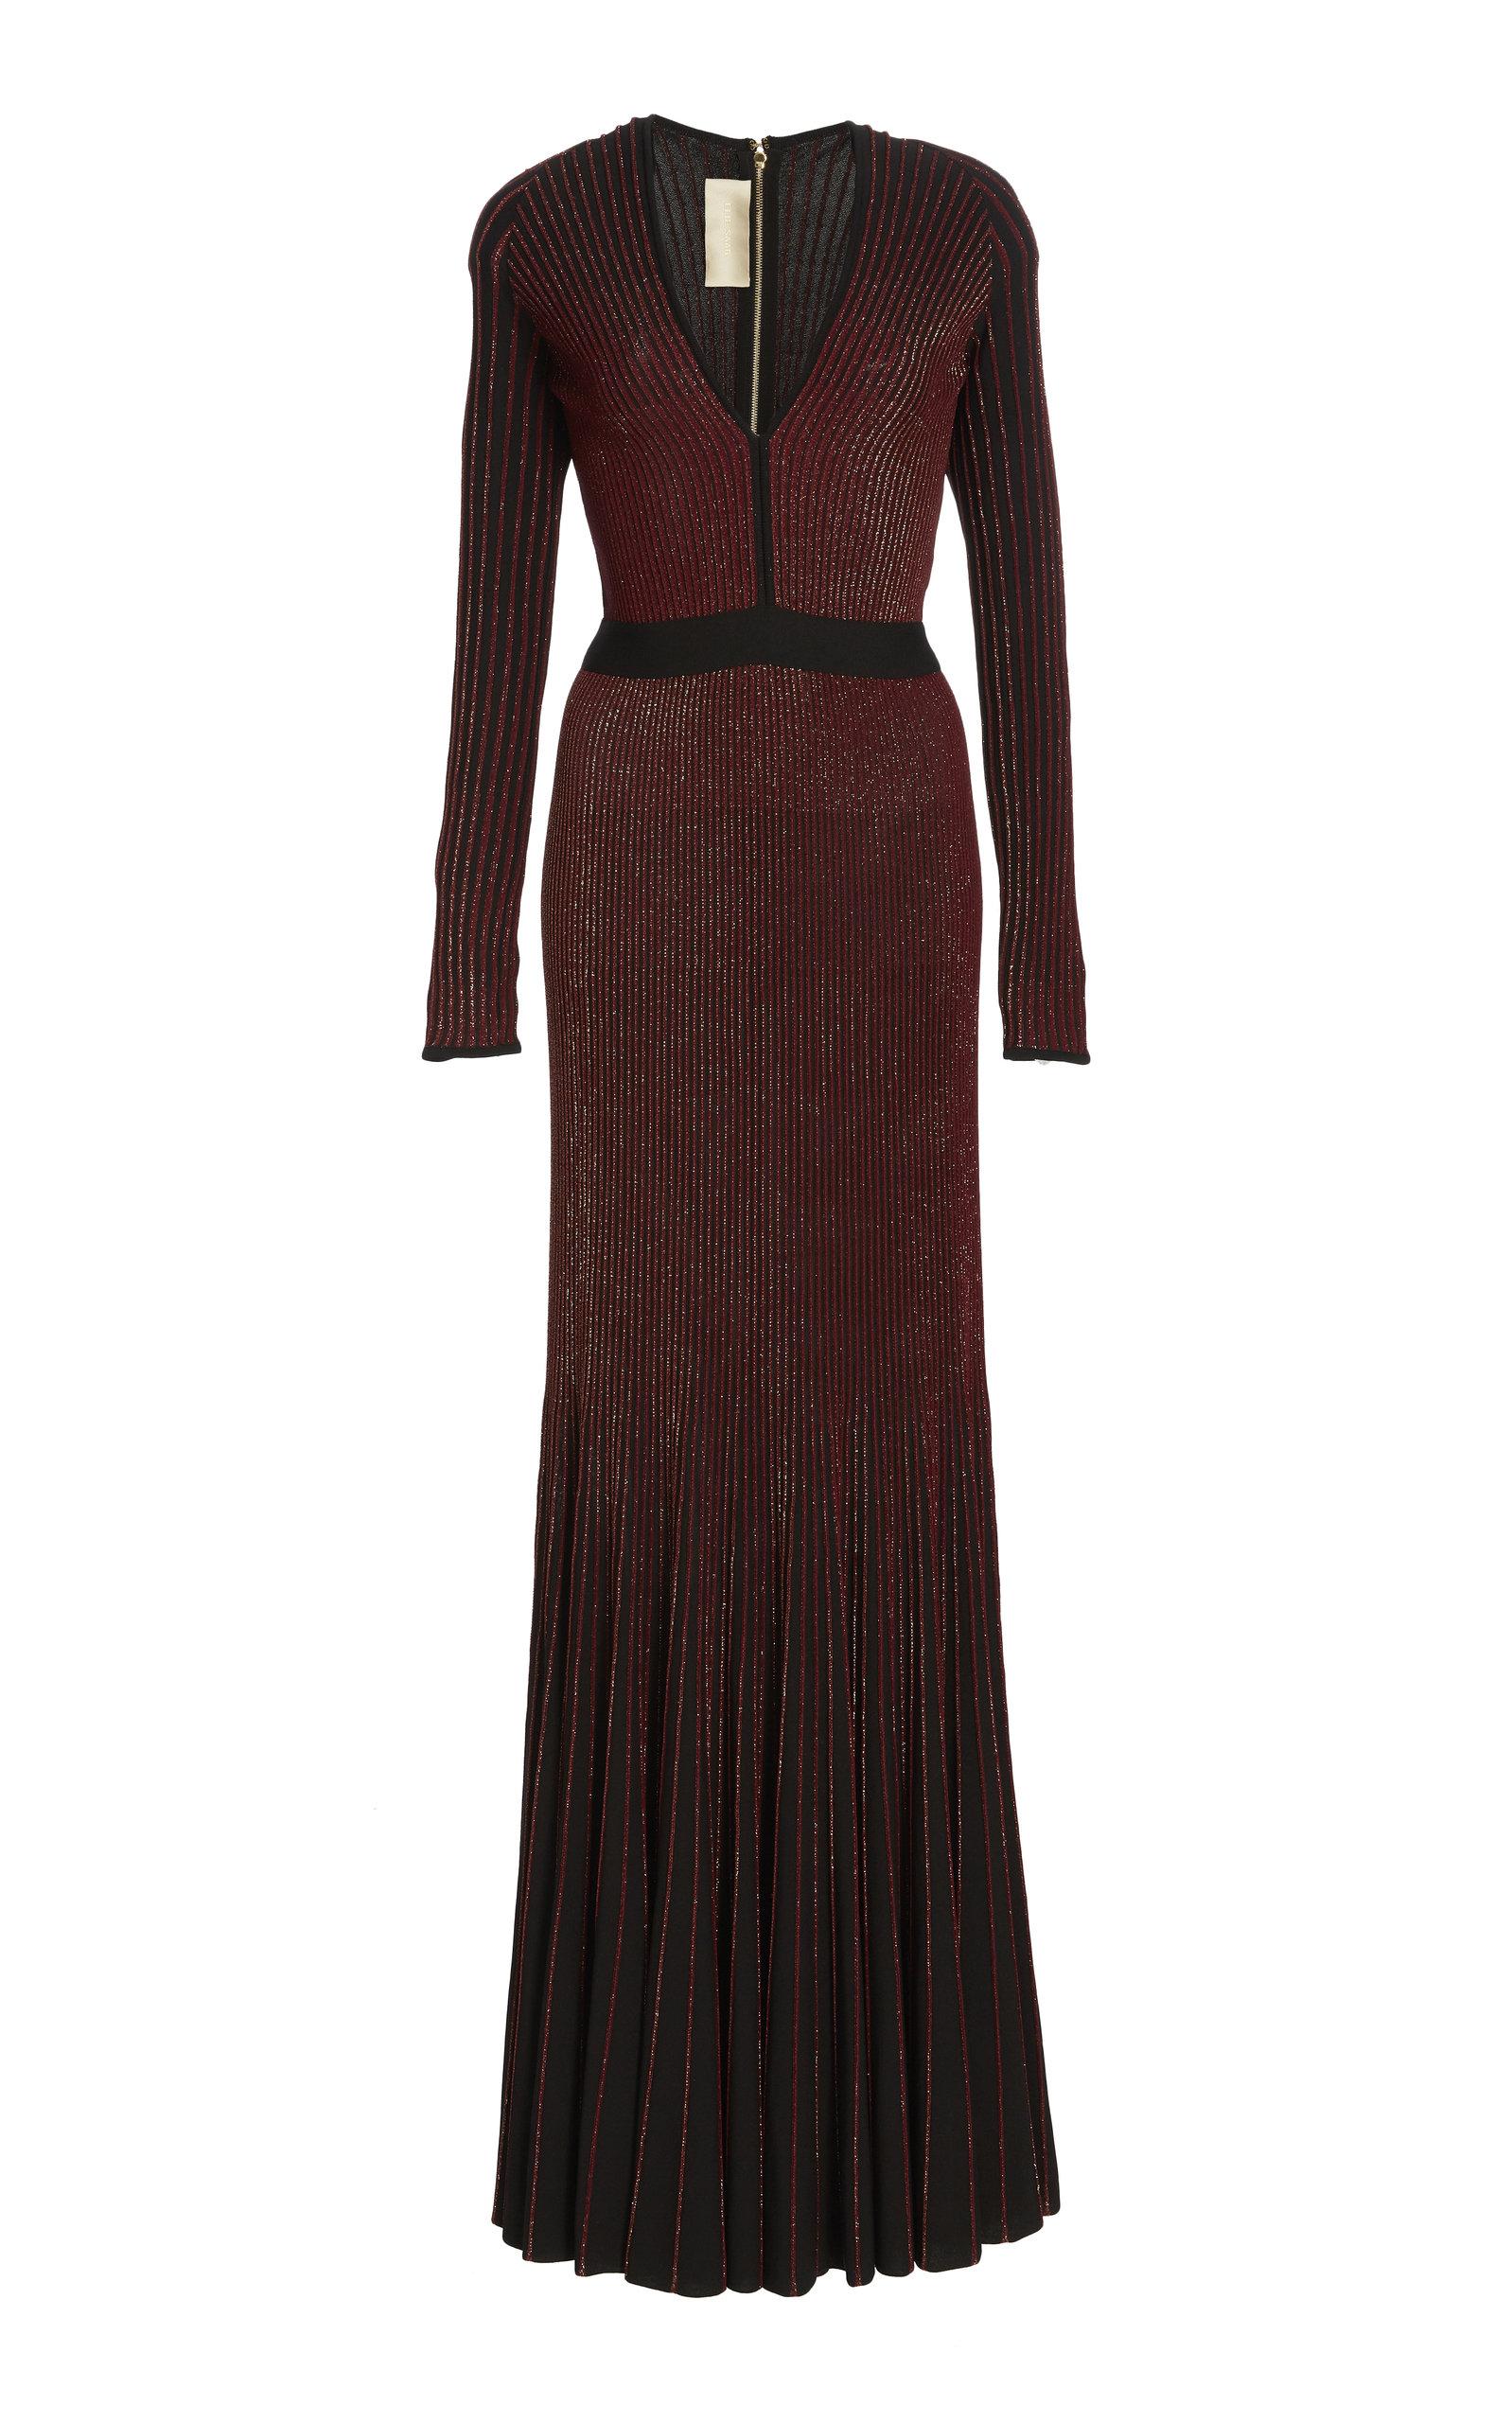 ELIE SAAB V-Neck Long-Sleeve Embellished Mermaid Evening Gown in Burgundy